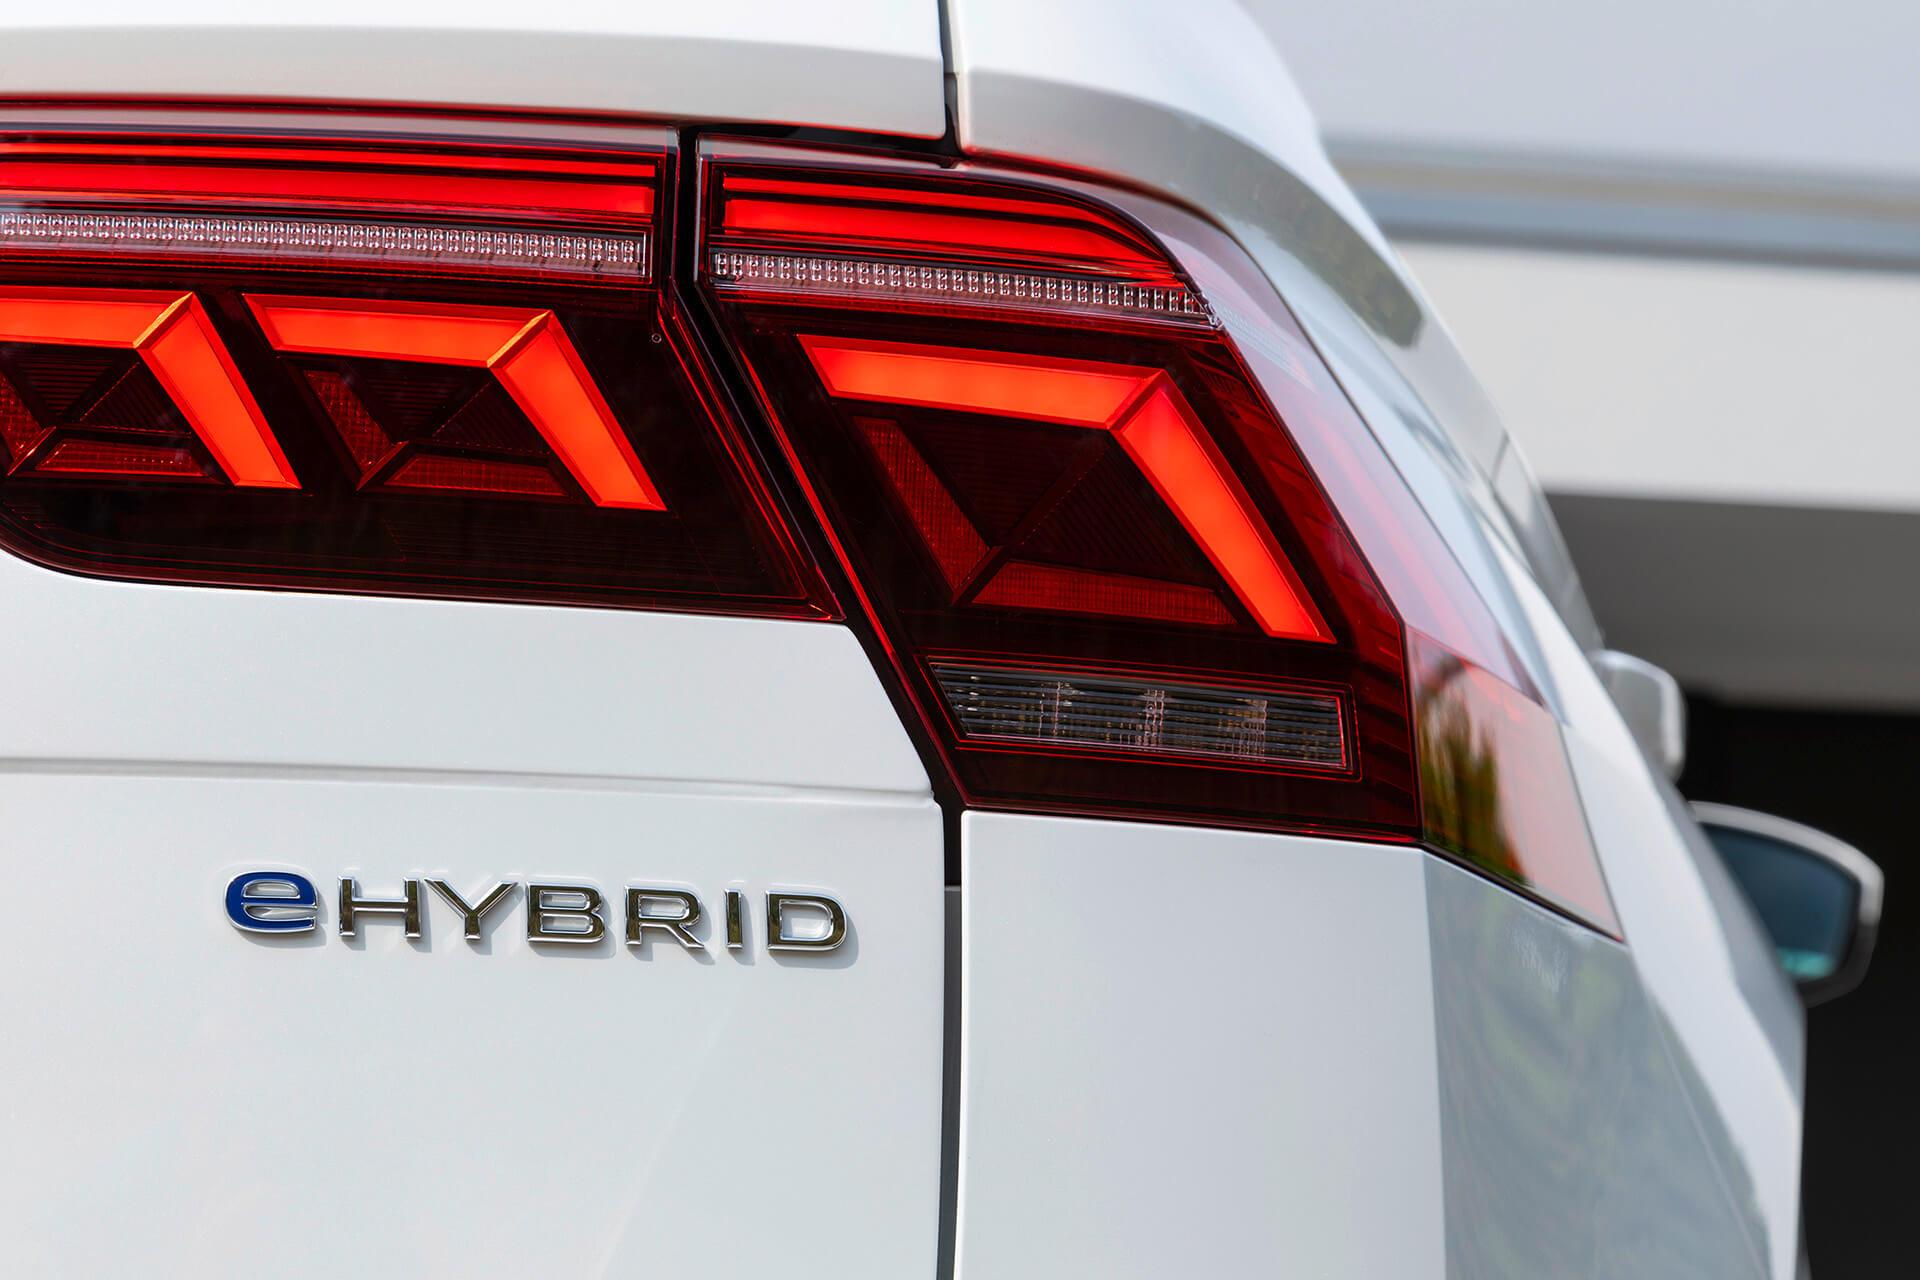 Volkswagen Tiguan - Διακριτικό έμβλημα eHybrid